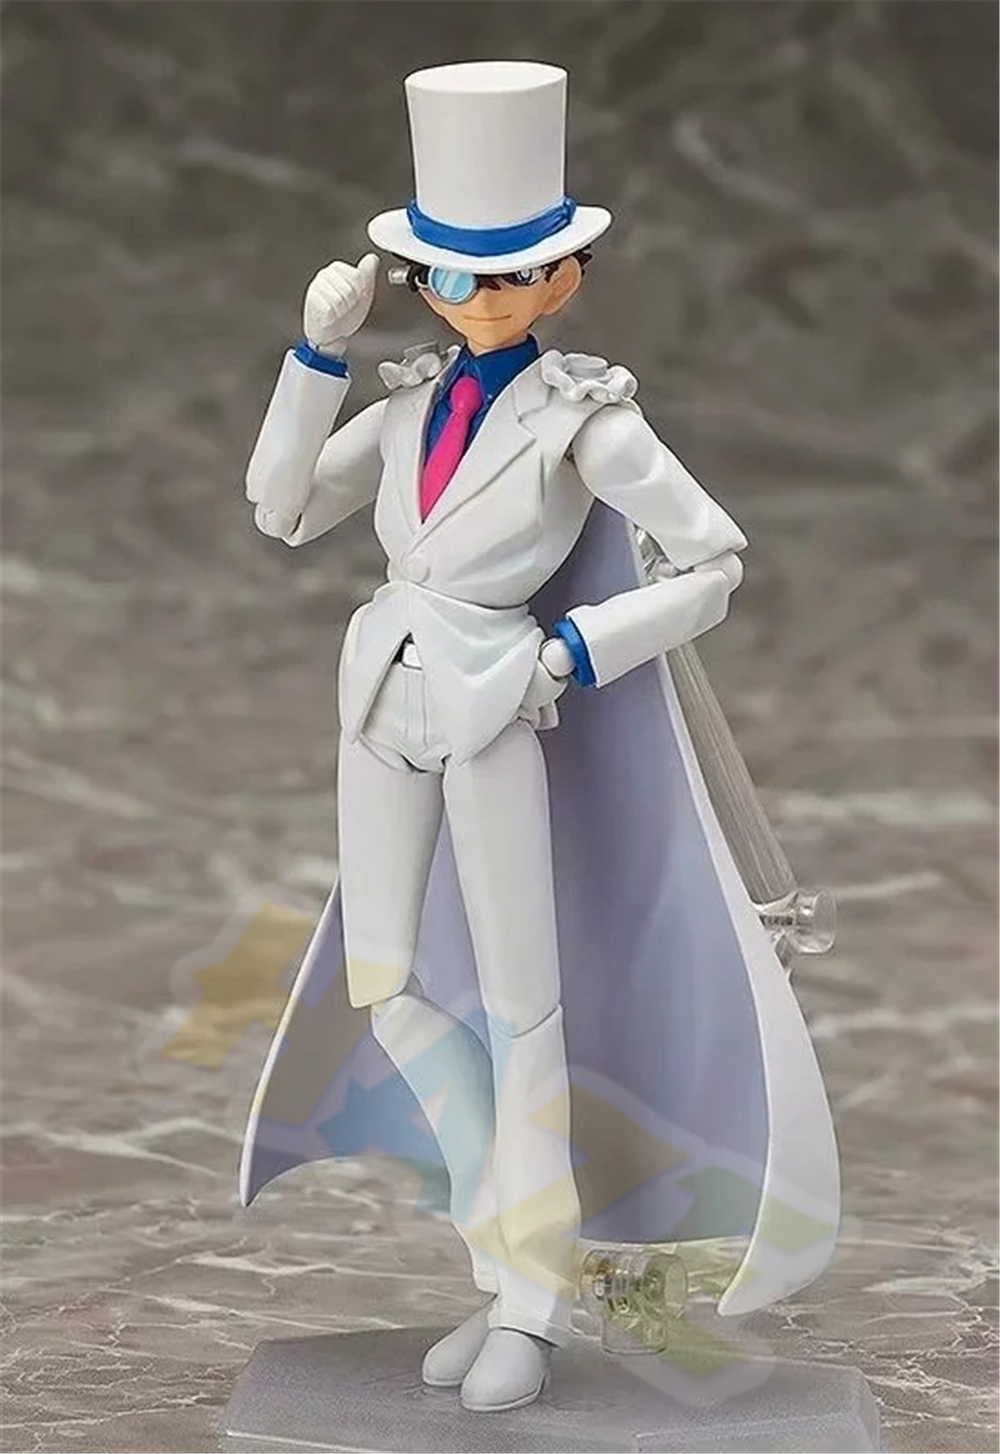 Figma SP-088# Detective Conan KID the Phantom Thief PVC Figure Toy Model